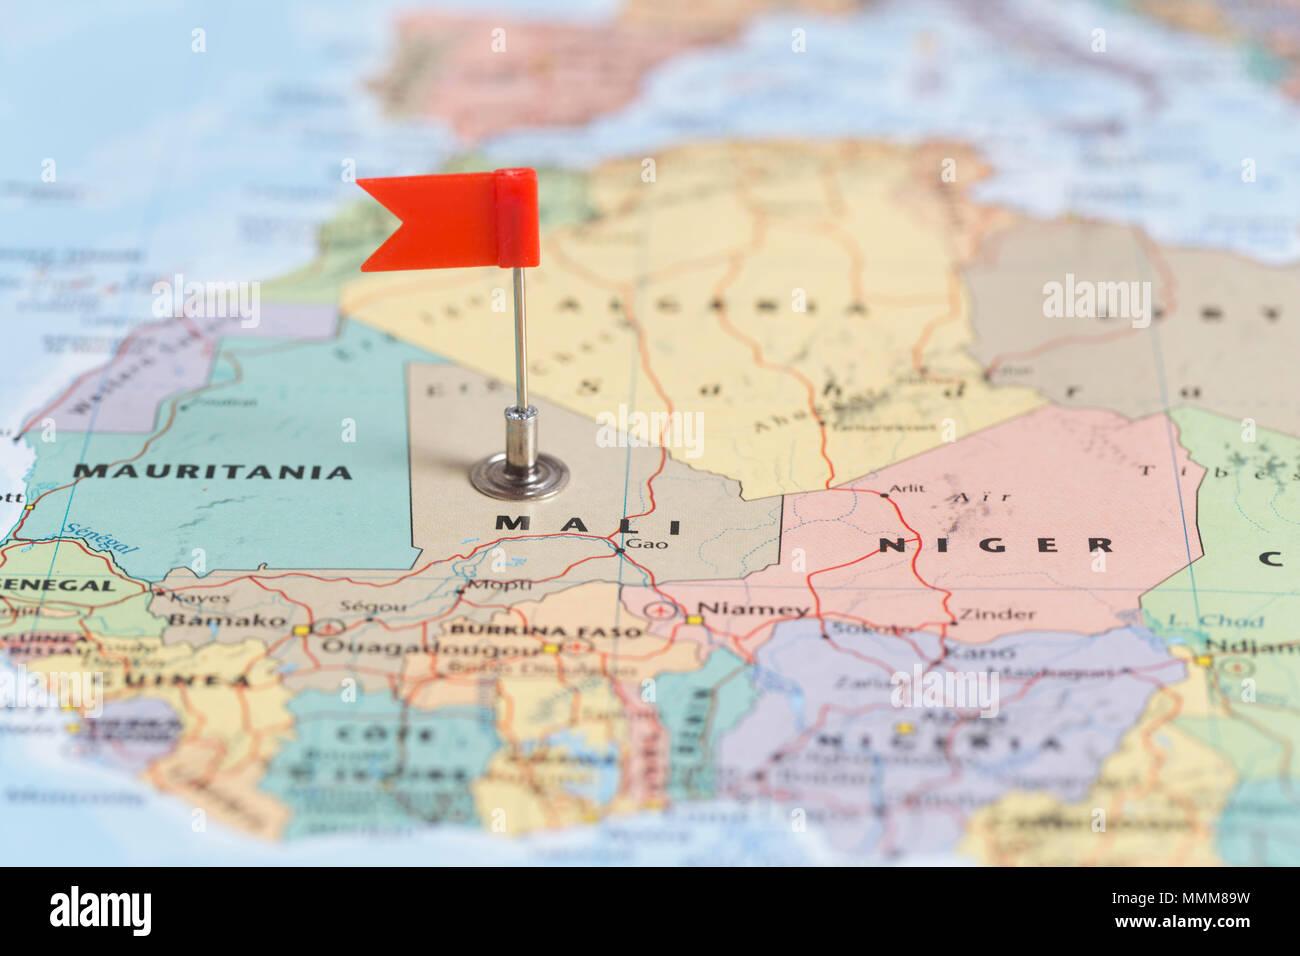 Map Mali Stockfotos & Map Mali Bilder - Alamy